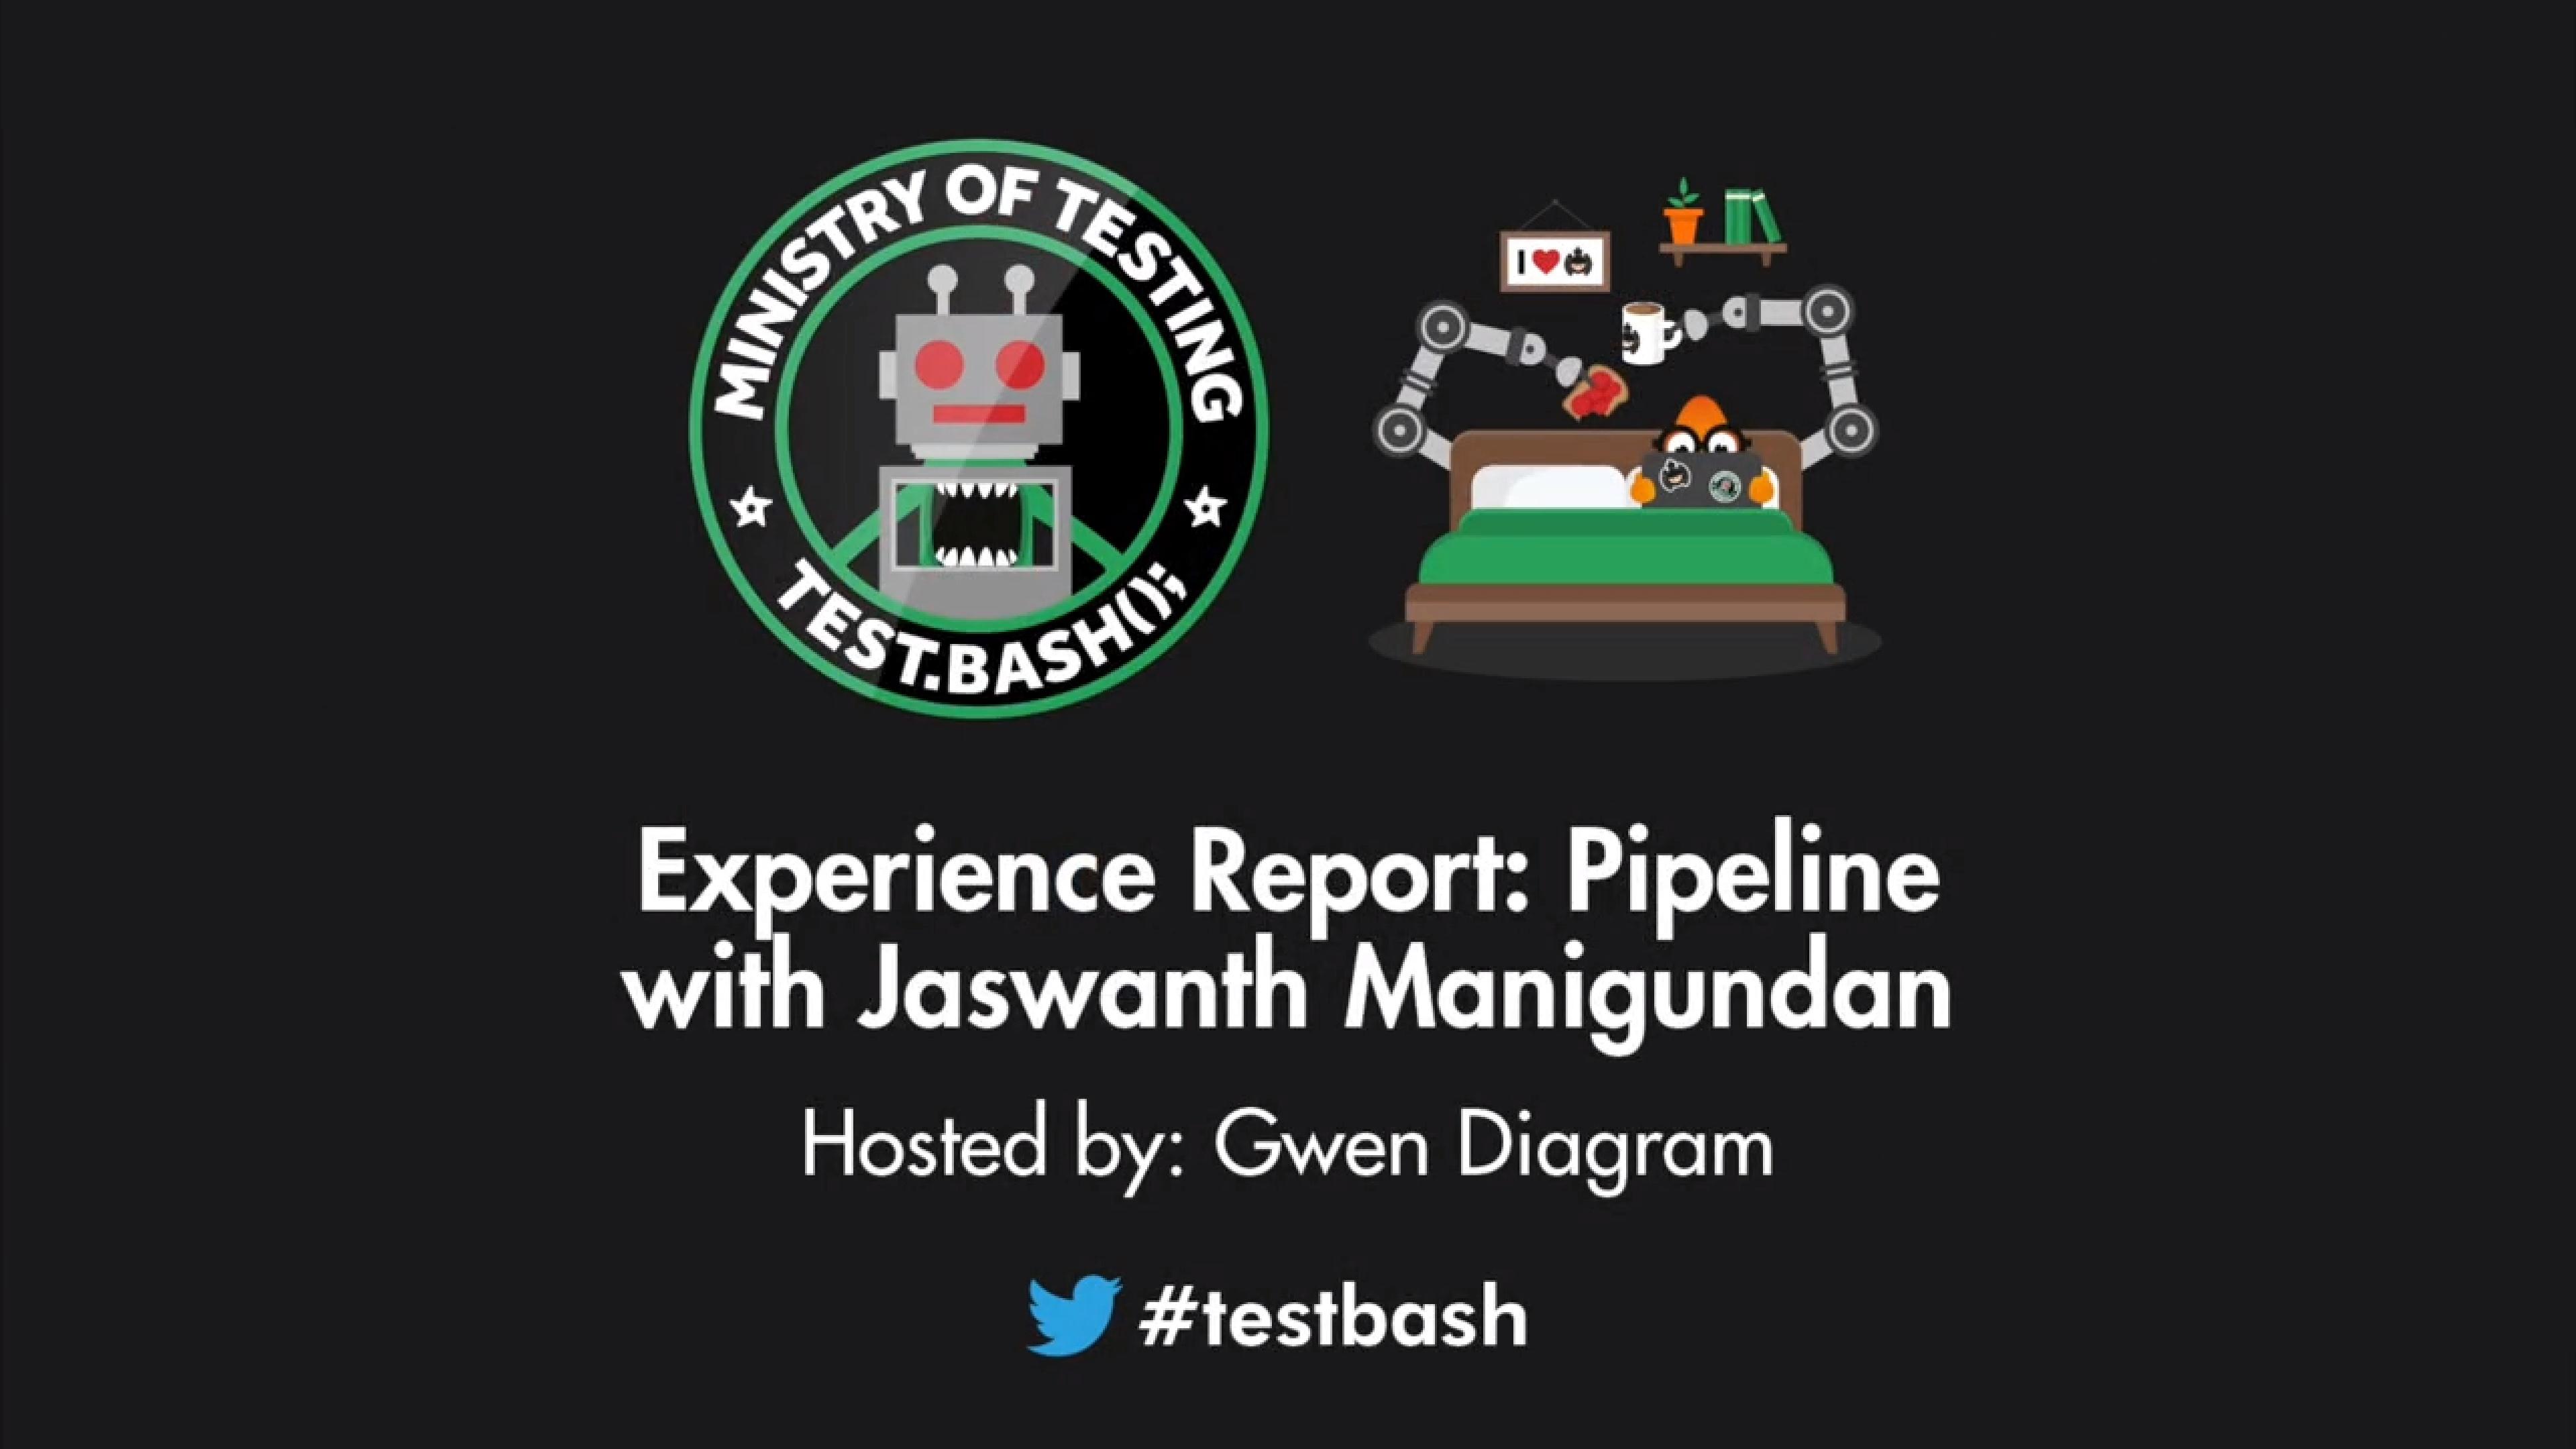 Experience Report: Pipeline - Jaswanth Manigundan